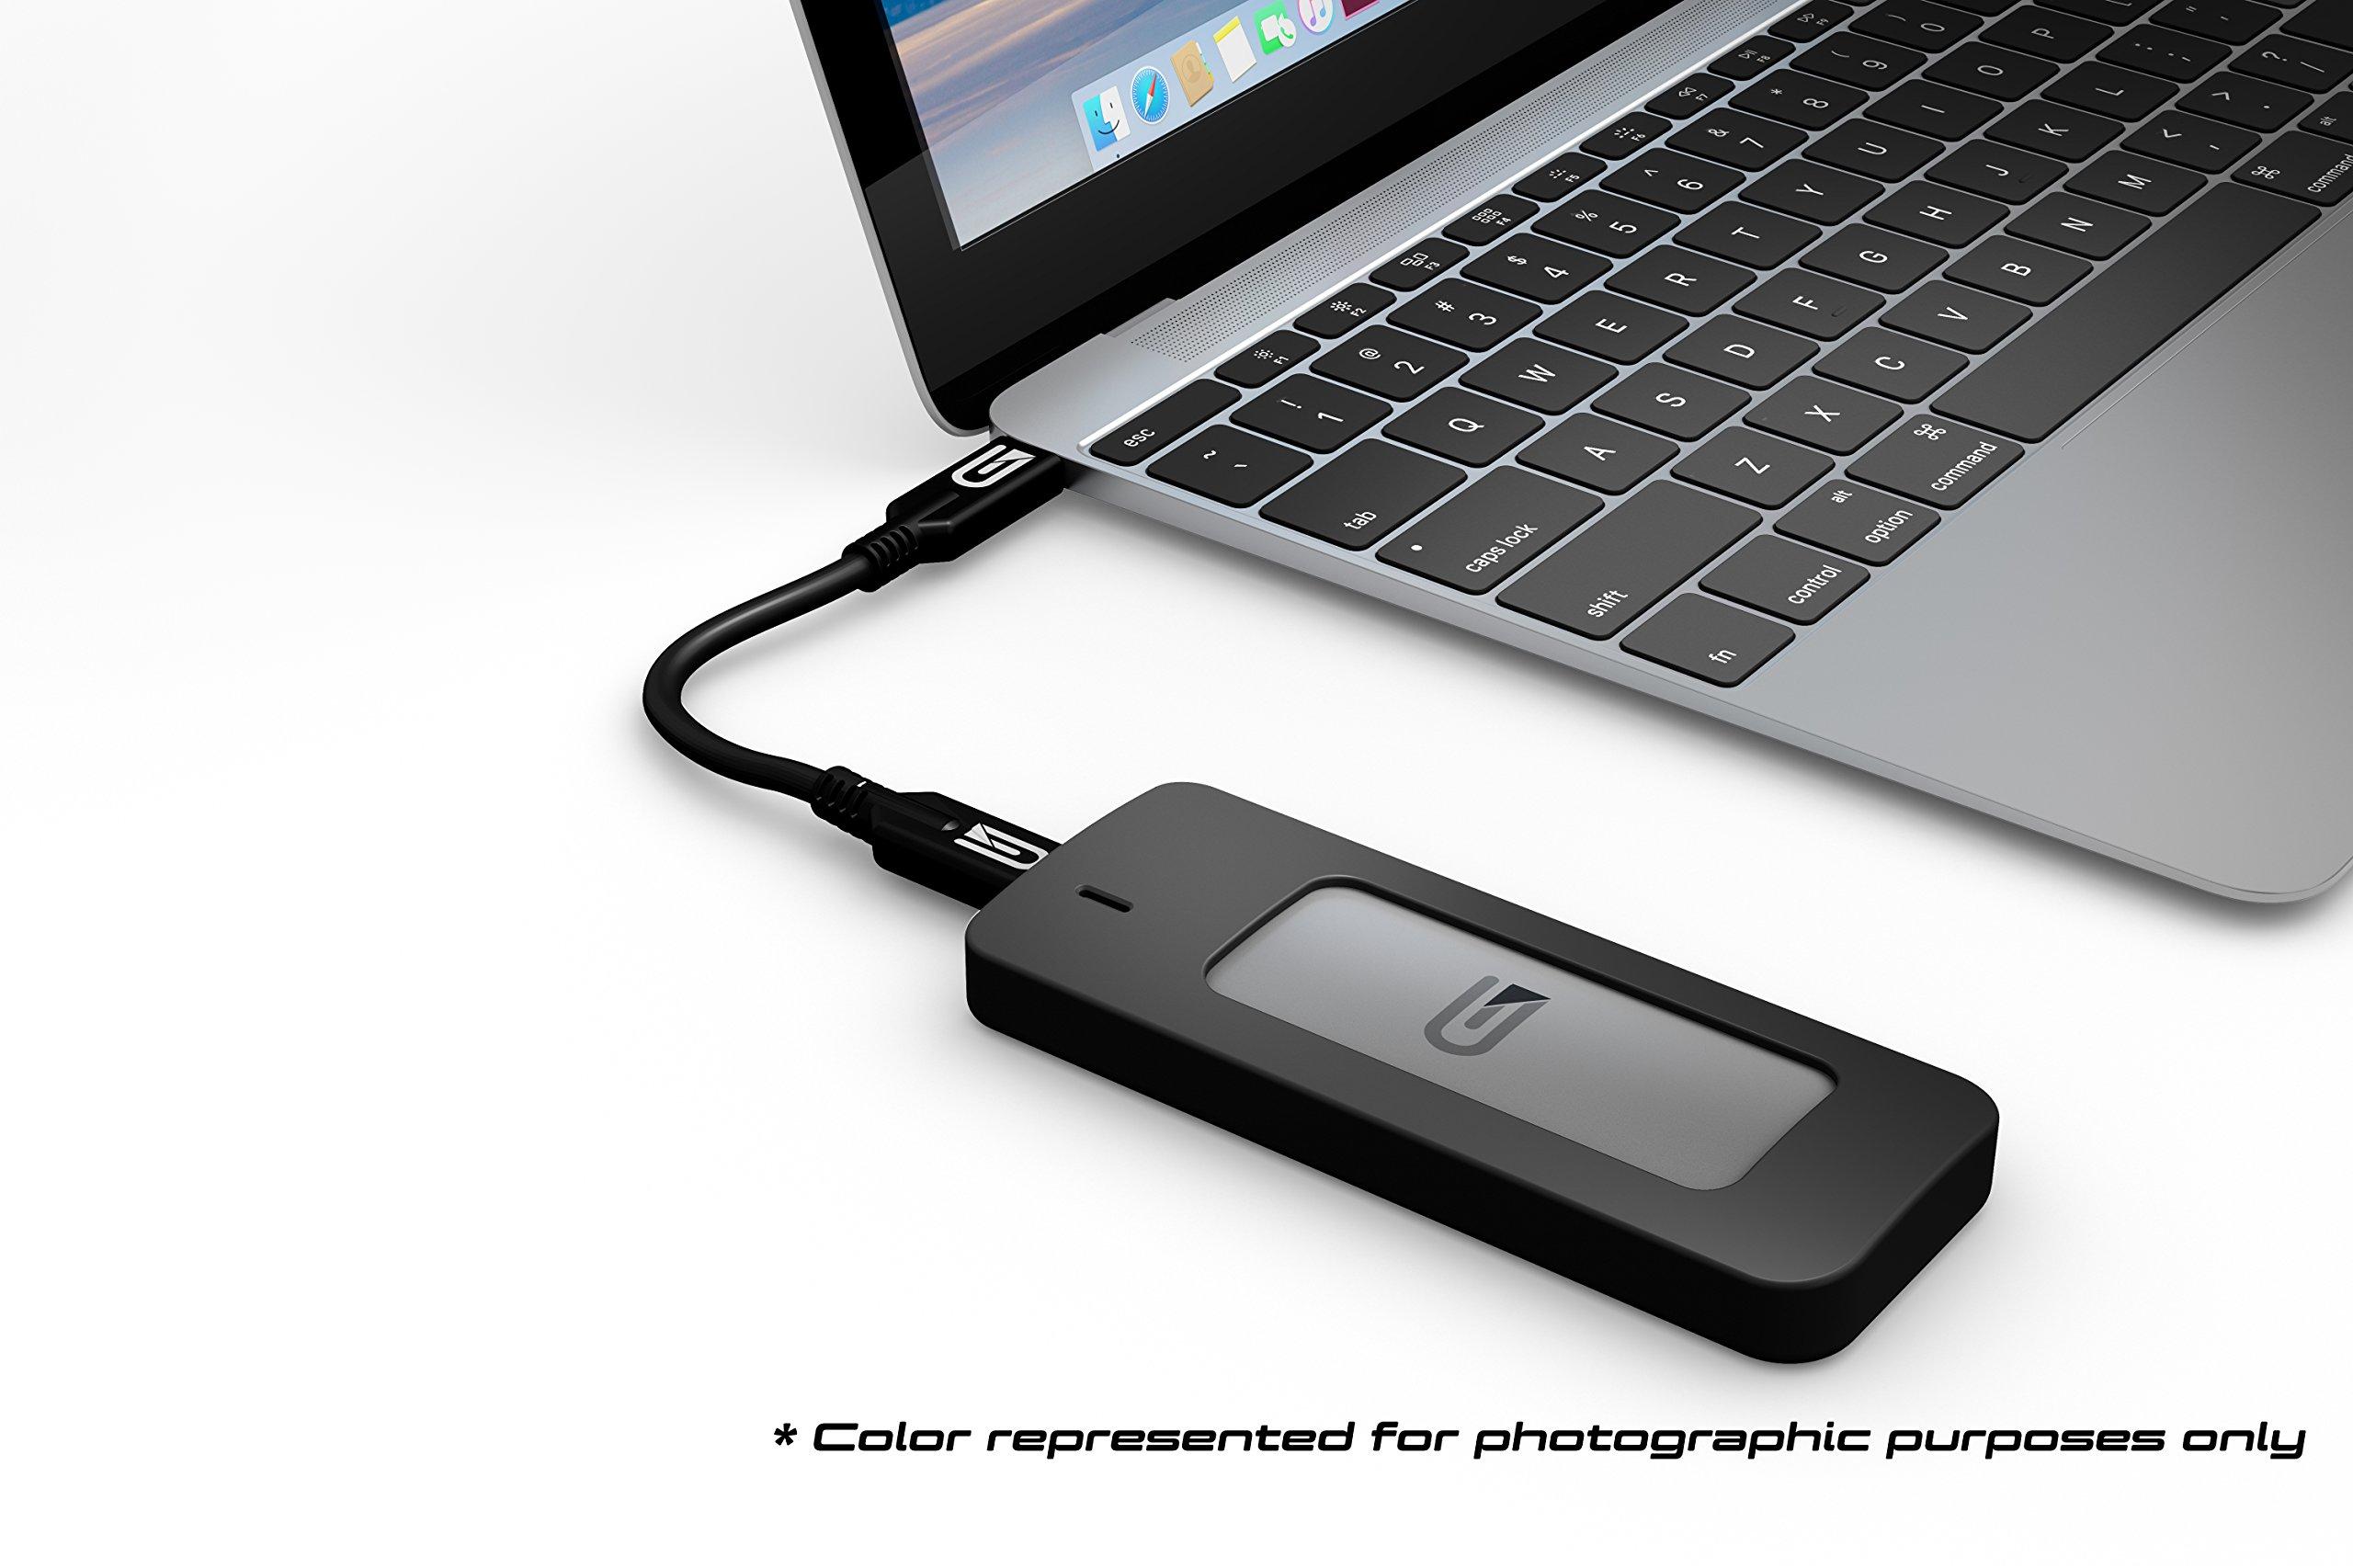 Glyph Atom SSD 2TB Black (External USB-C, USB 3.0, Thunderbolt 3) A2000BLK by Glyph Production Technologies (Image #5)